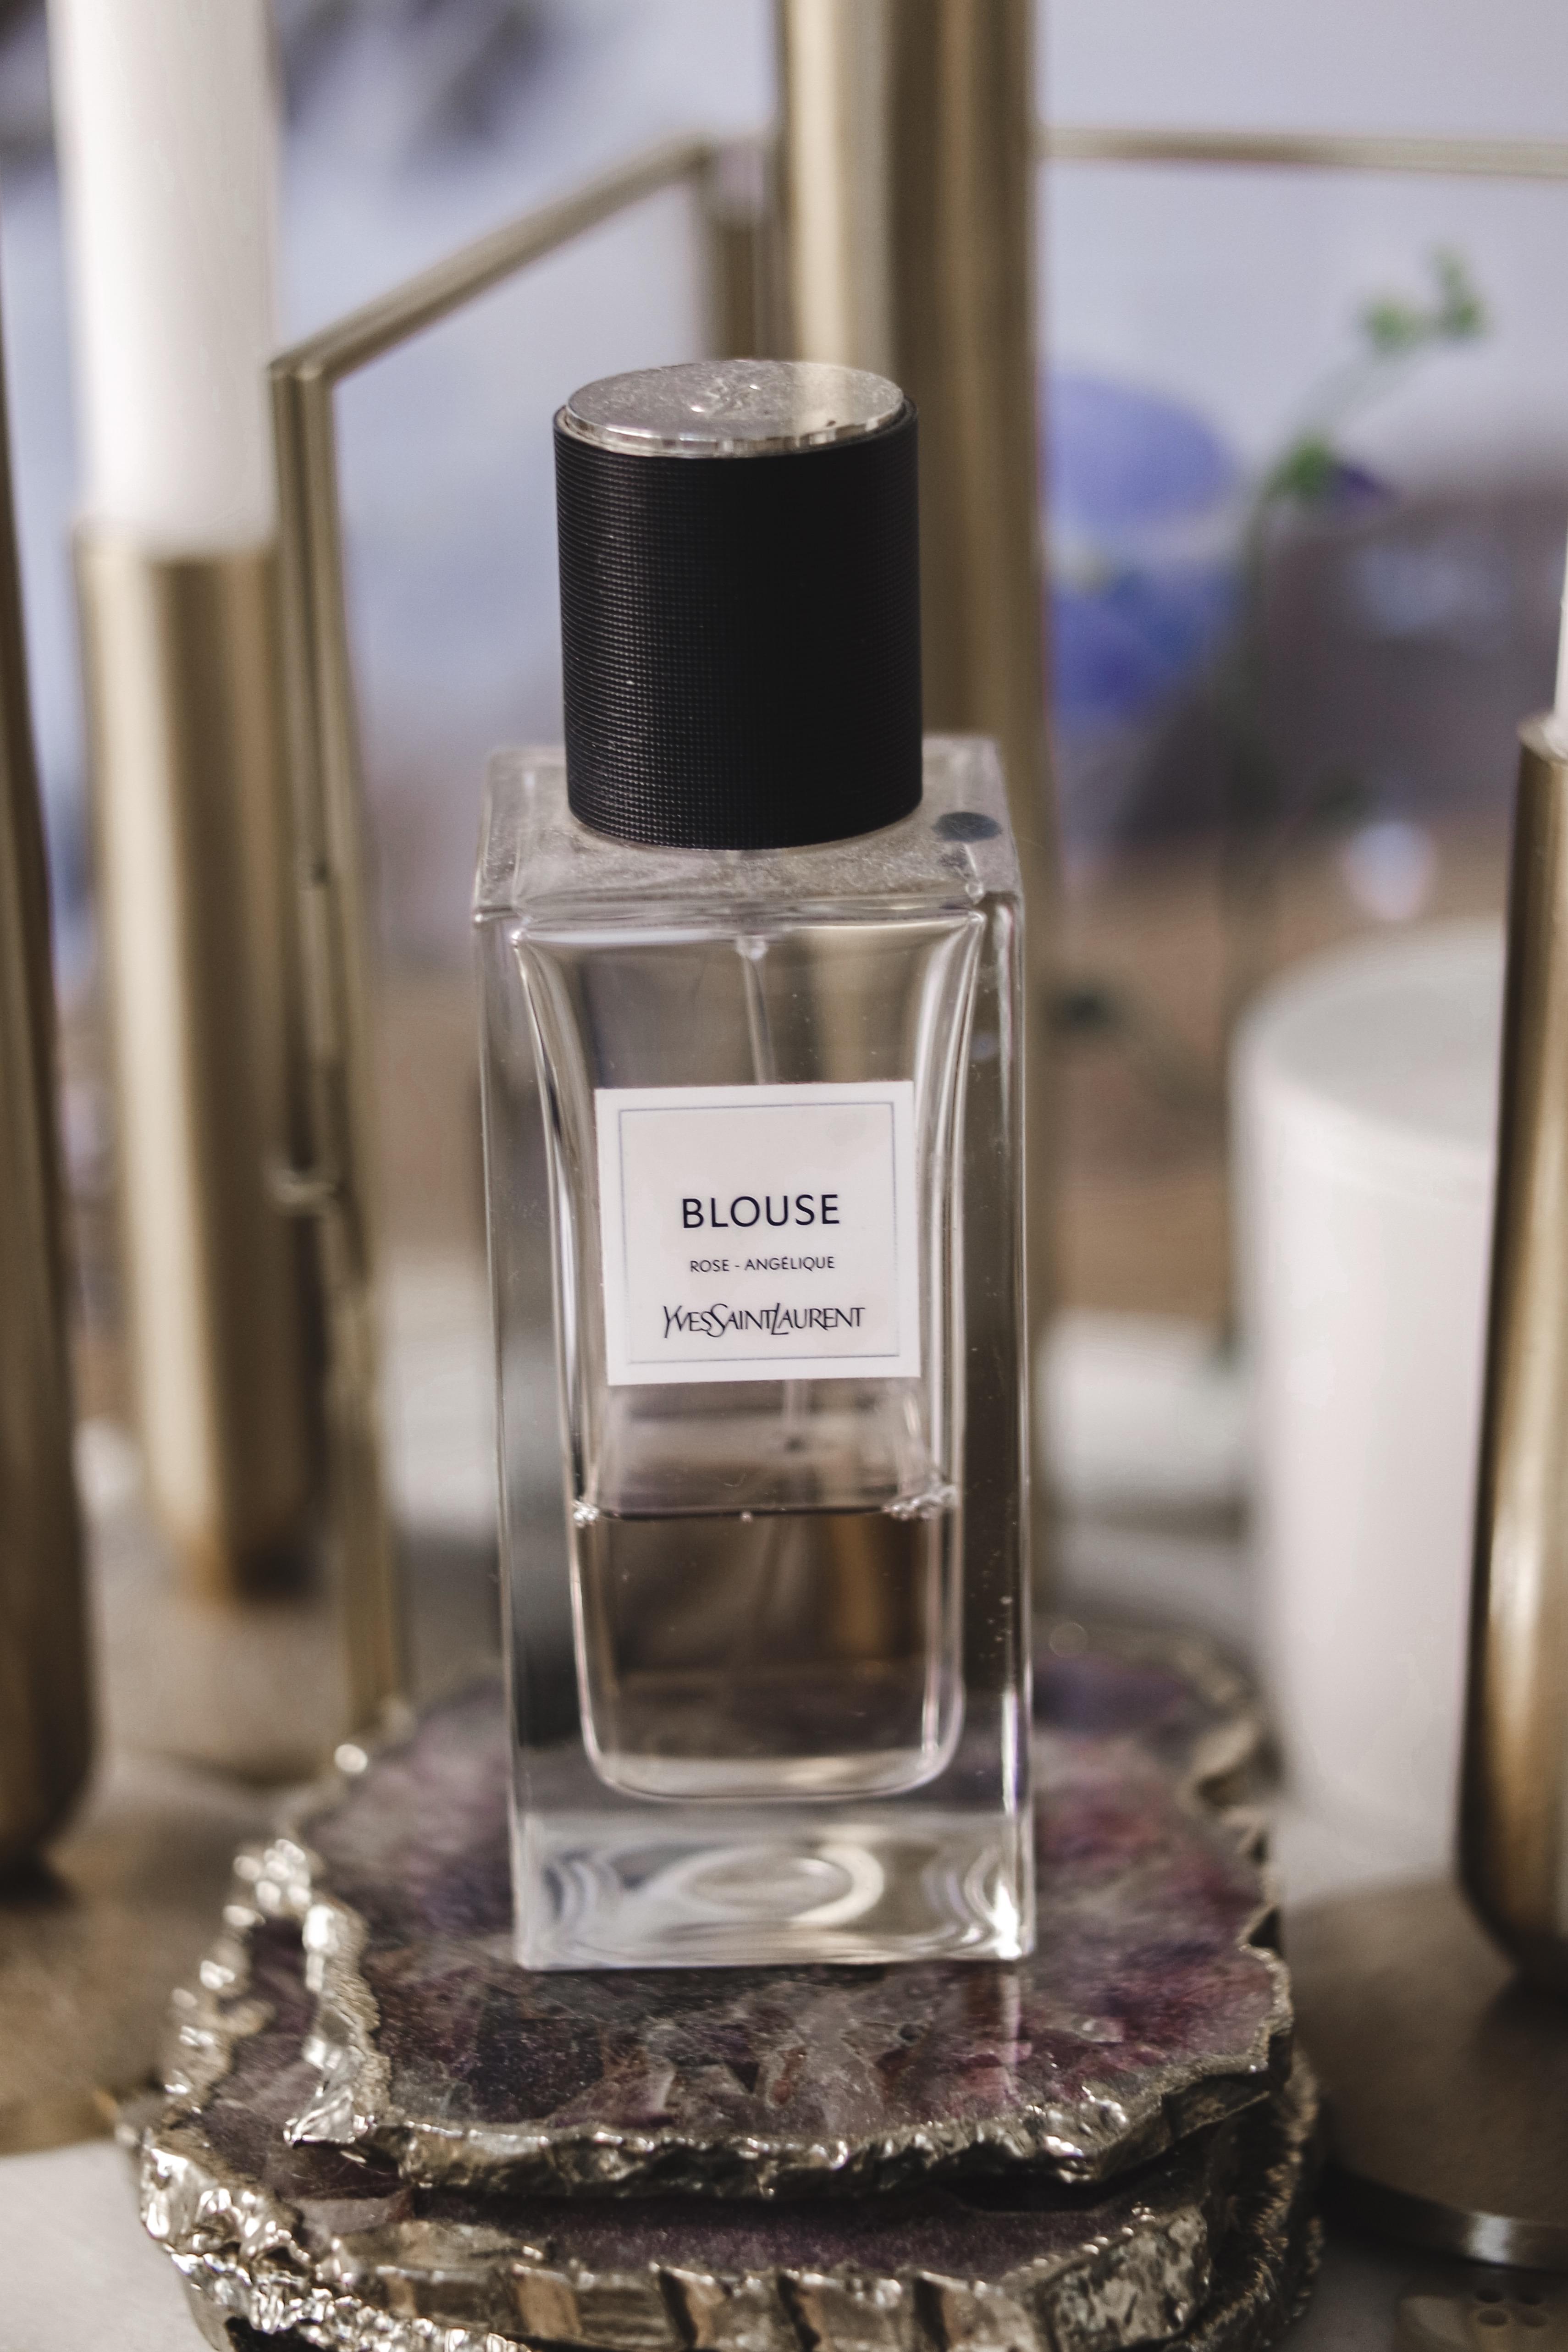 YSL Blouse Perfume - Yves Saint Laurent Perfume